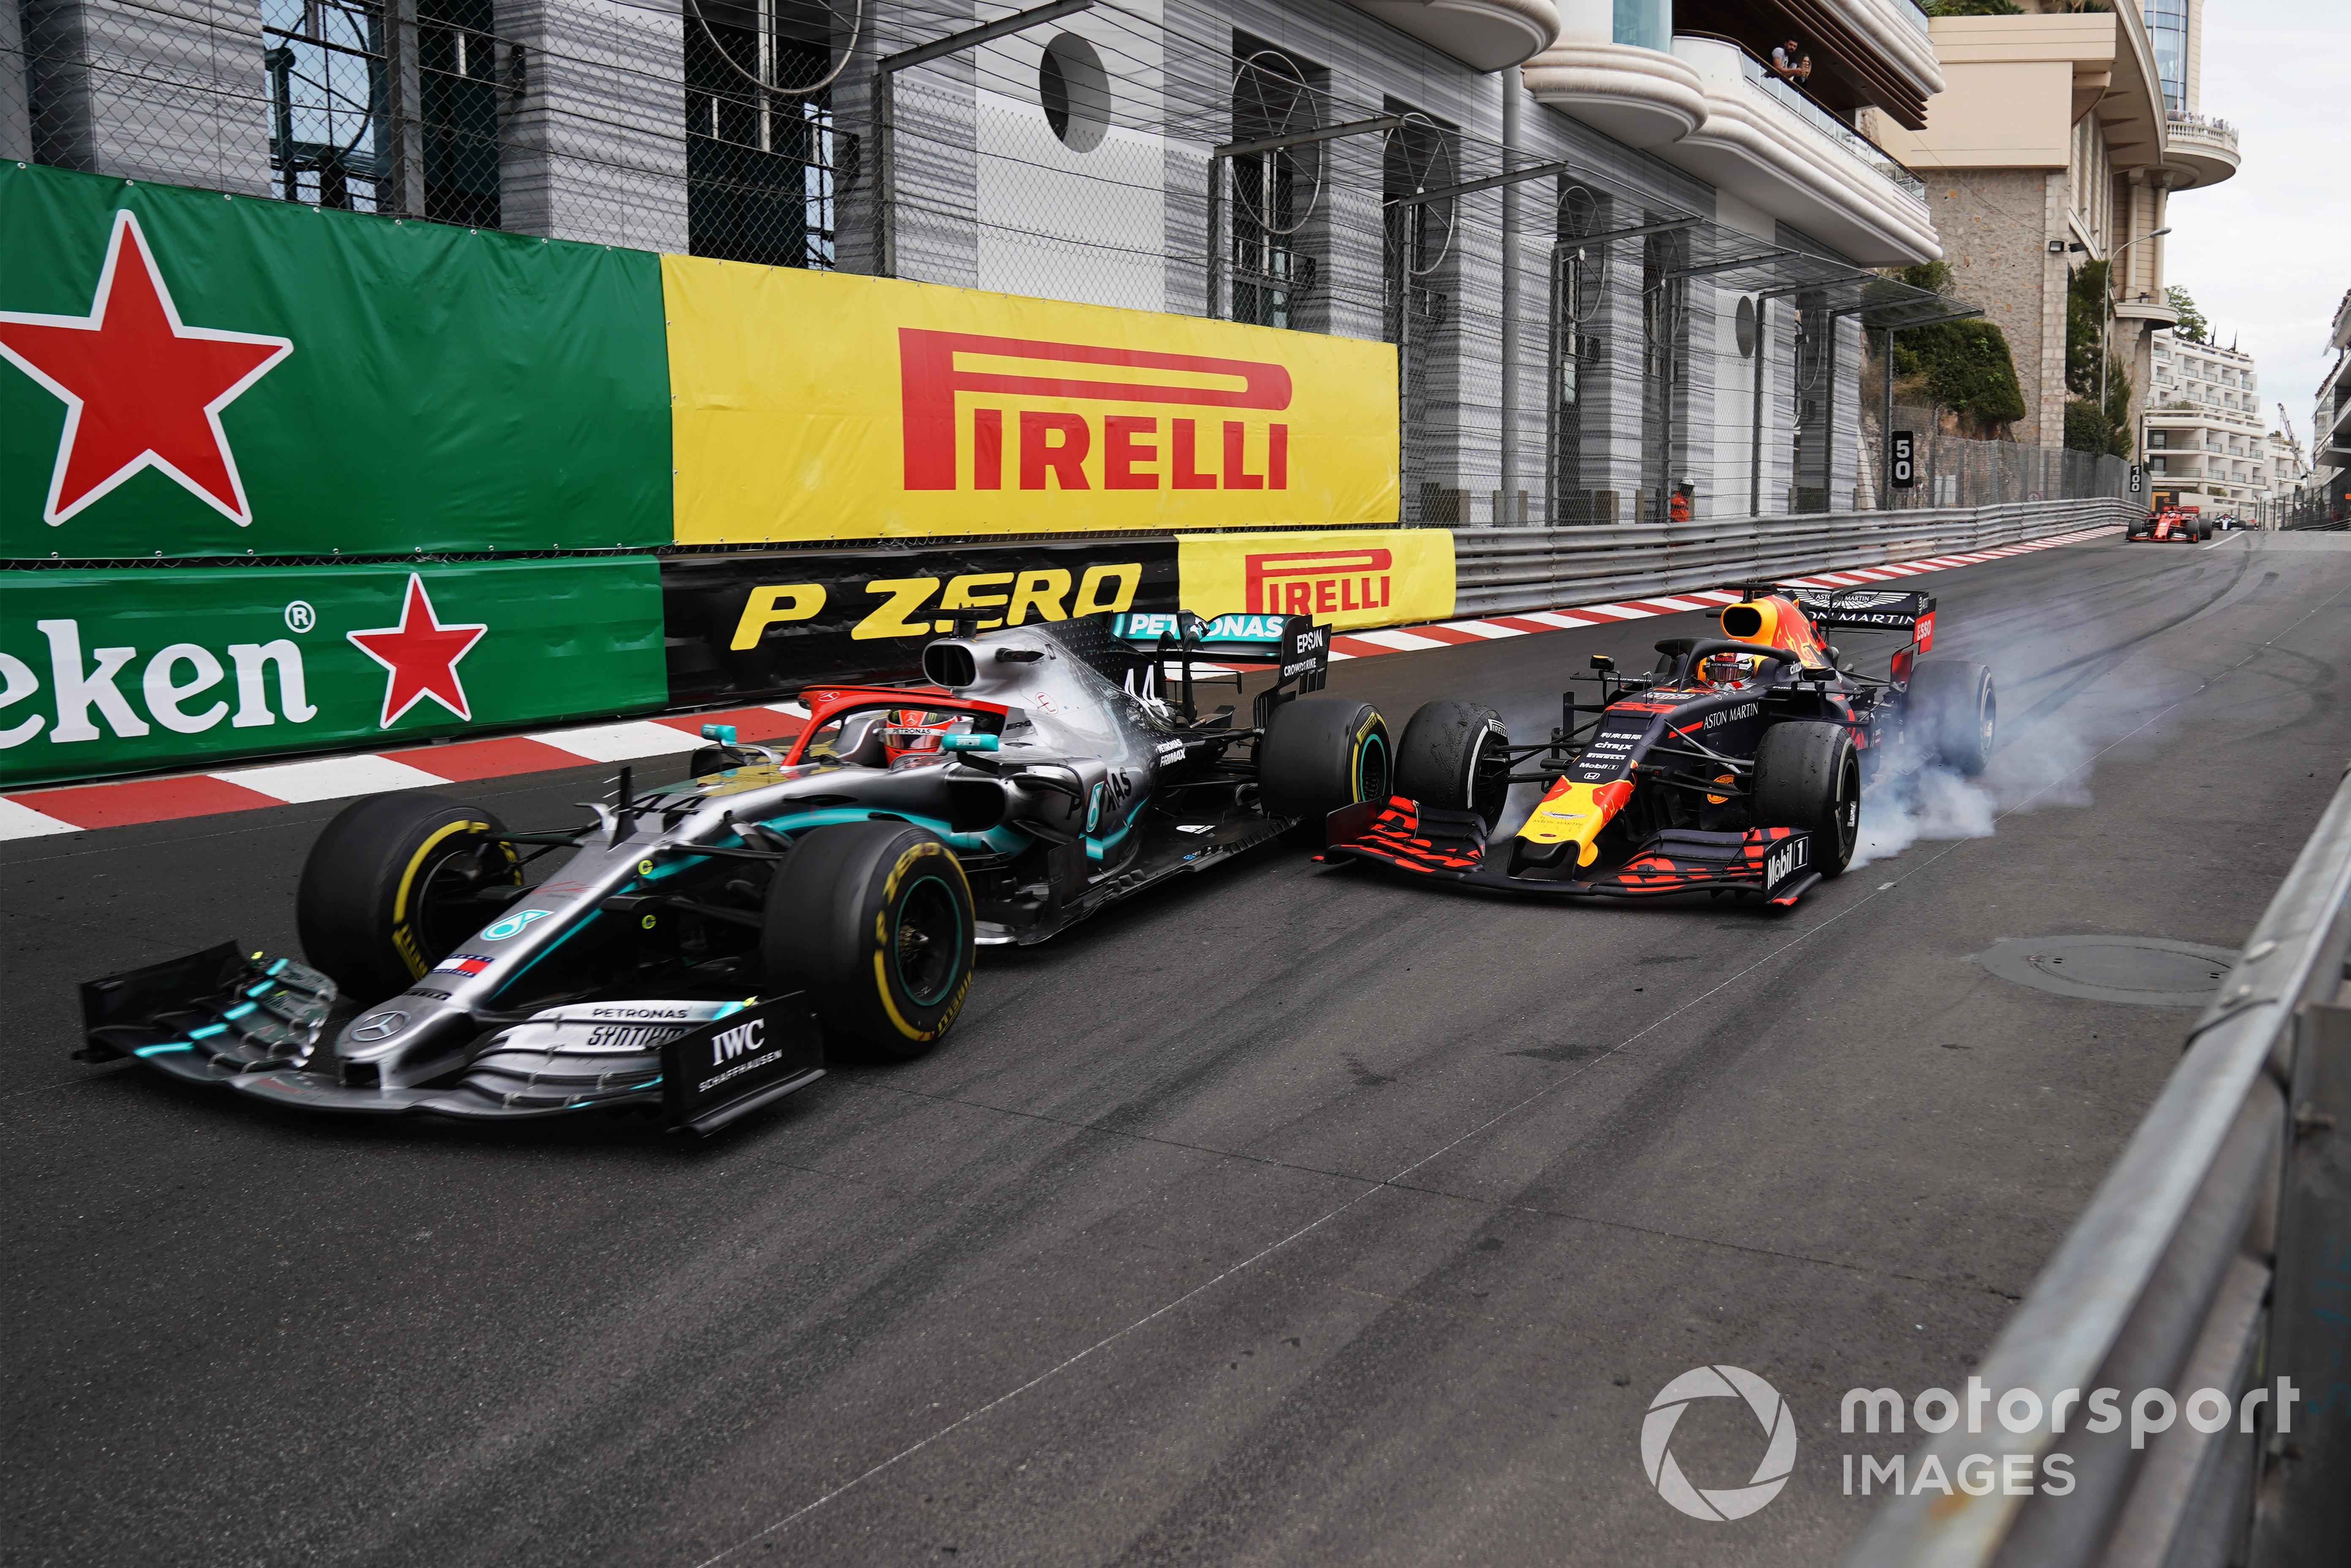 Lewis Hamilton, 2019 Monaco GP